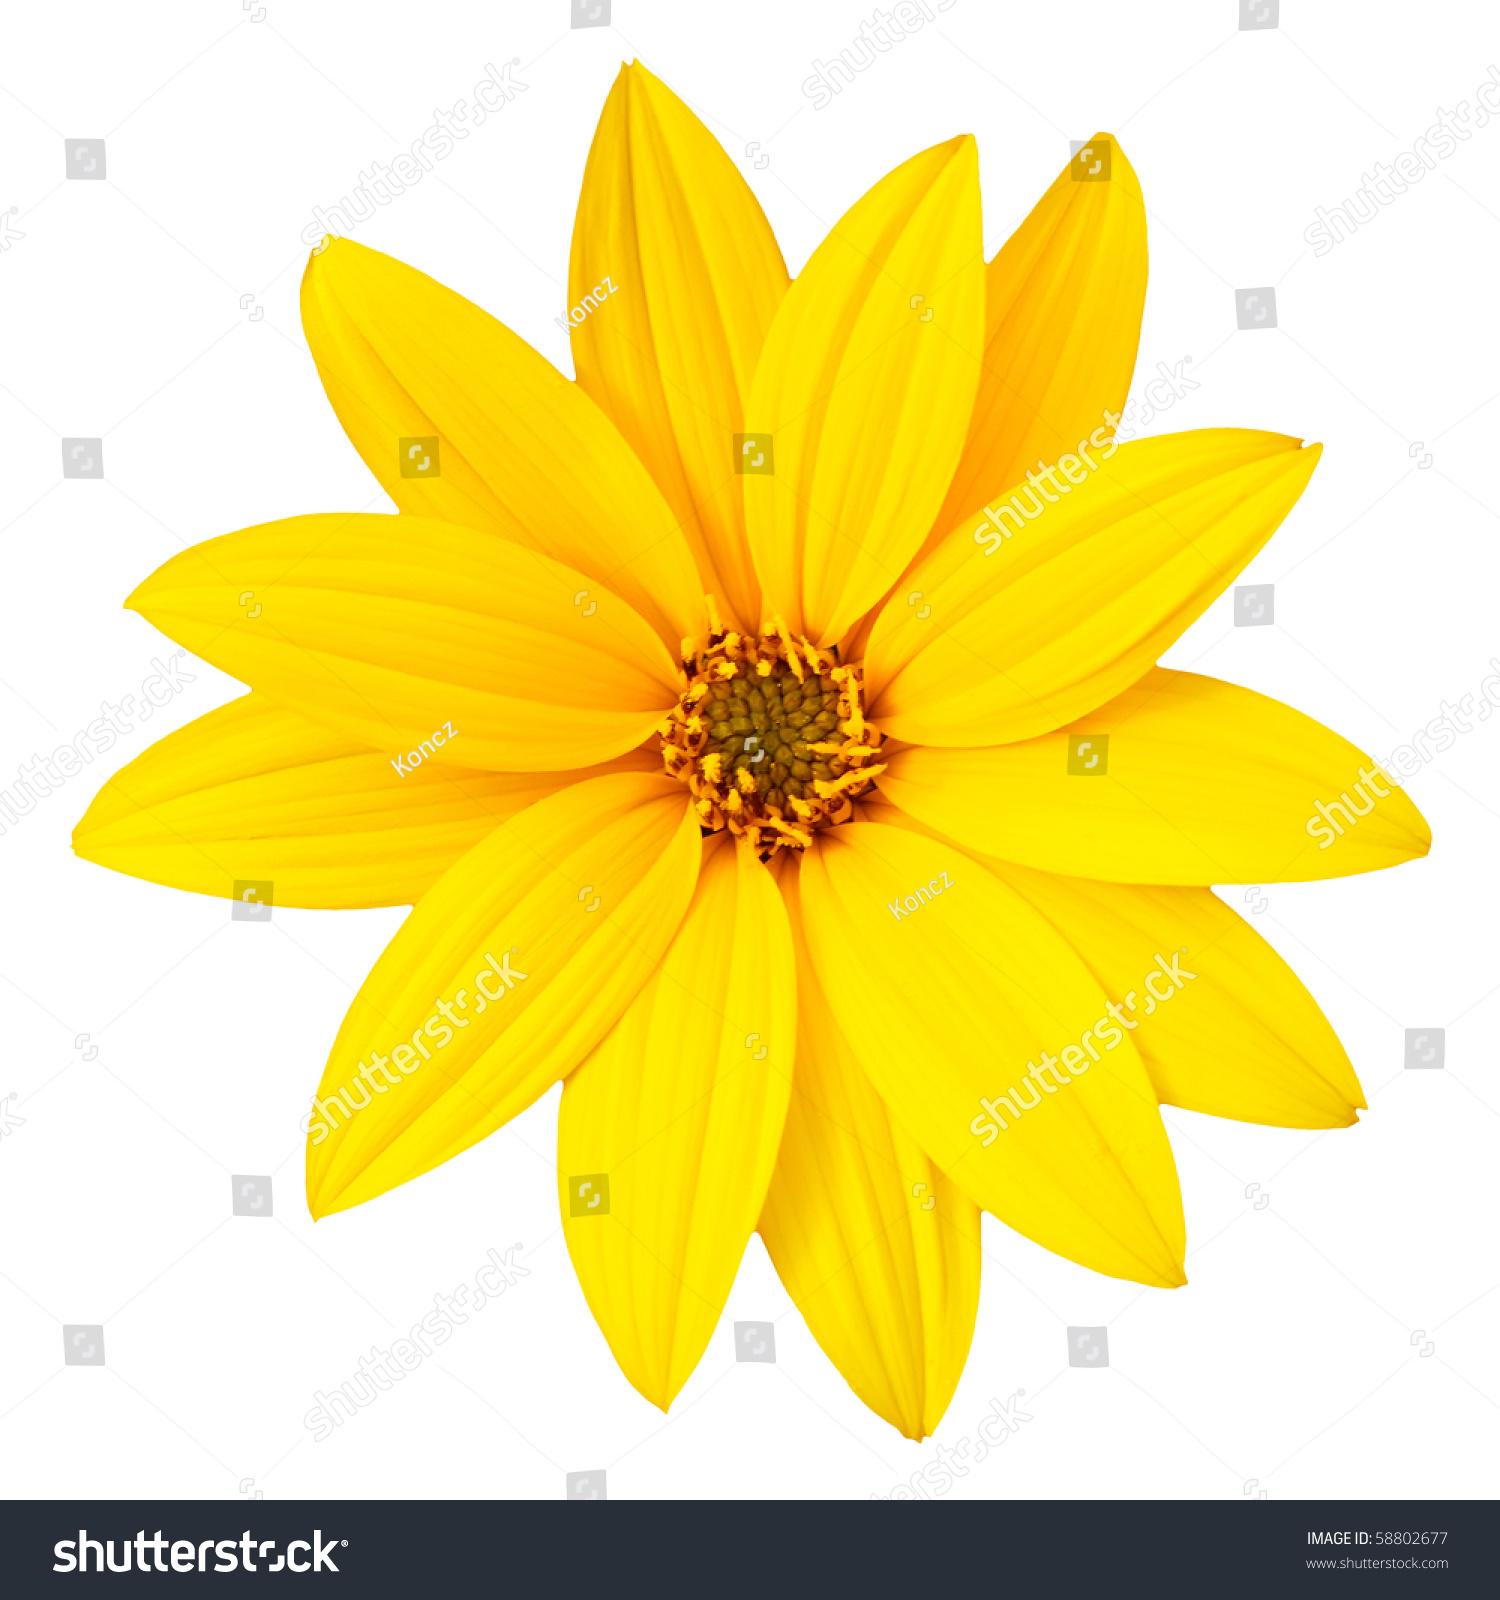 Yellow flower isolated on white background stock photo edit now yellow flower isolated on white background mightylinksfo